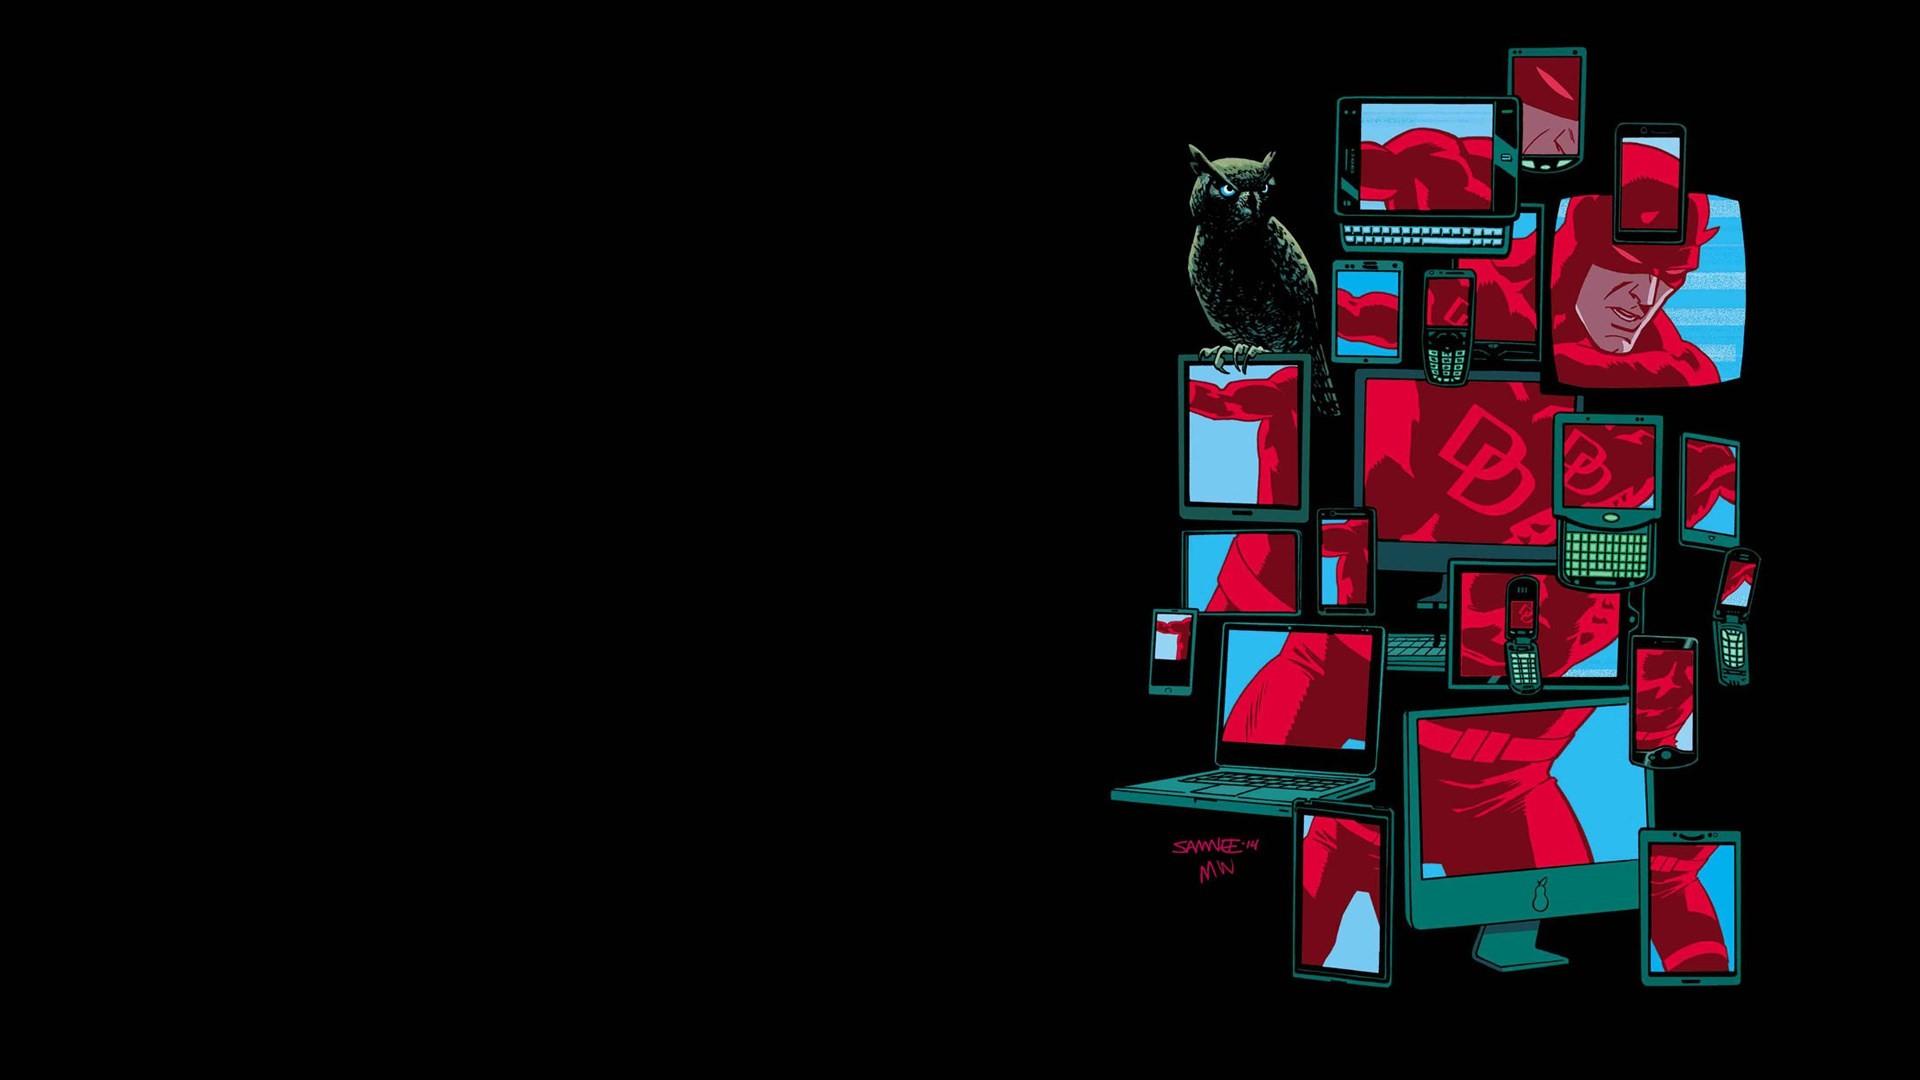 daredevil wallpaper: High Definition Backgrounds, 143 kB – Van MacDonald